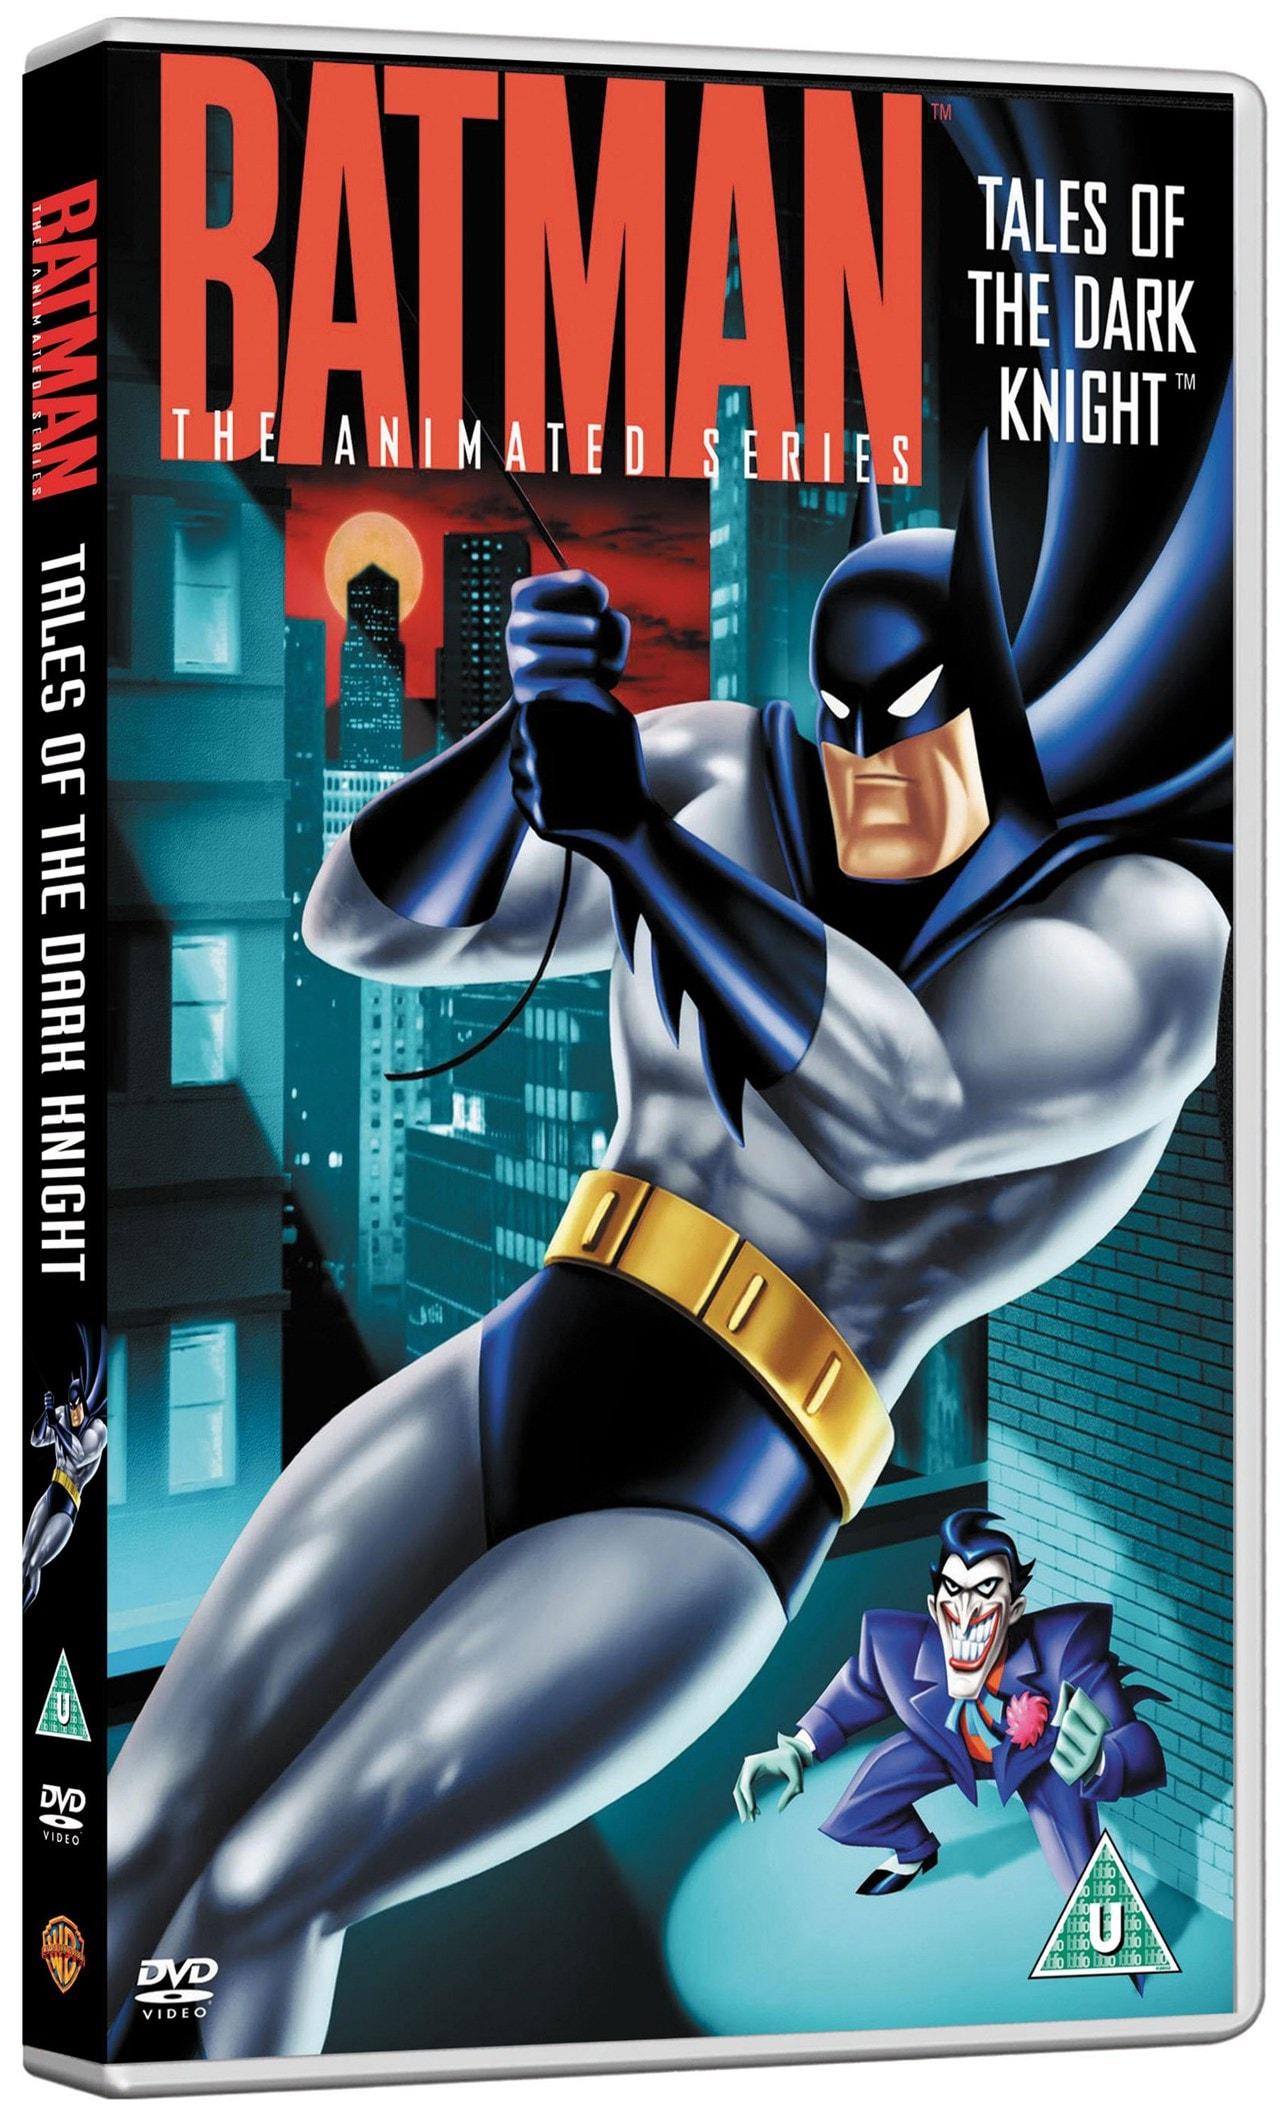 Batman - The Animated Series: Volume 2 - Tales of the Dark Knight - 2